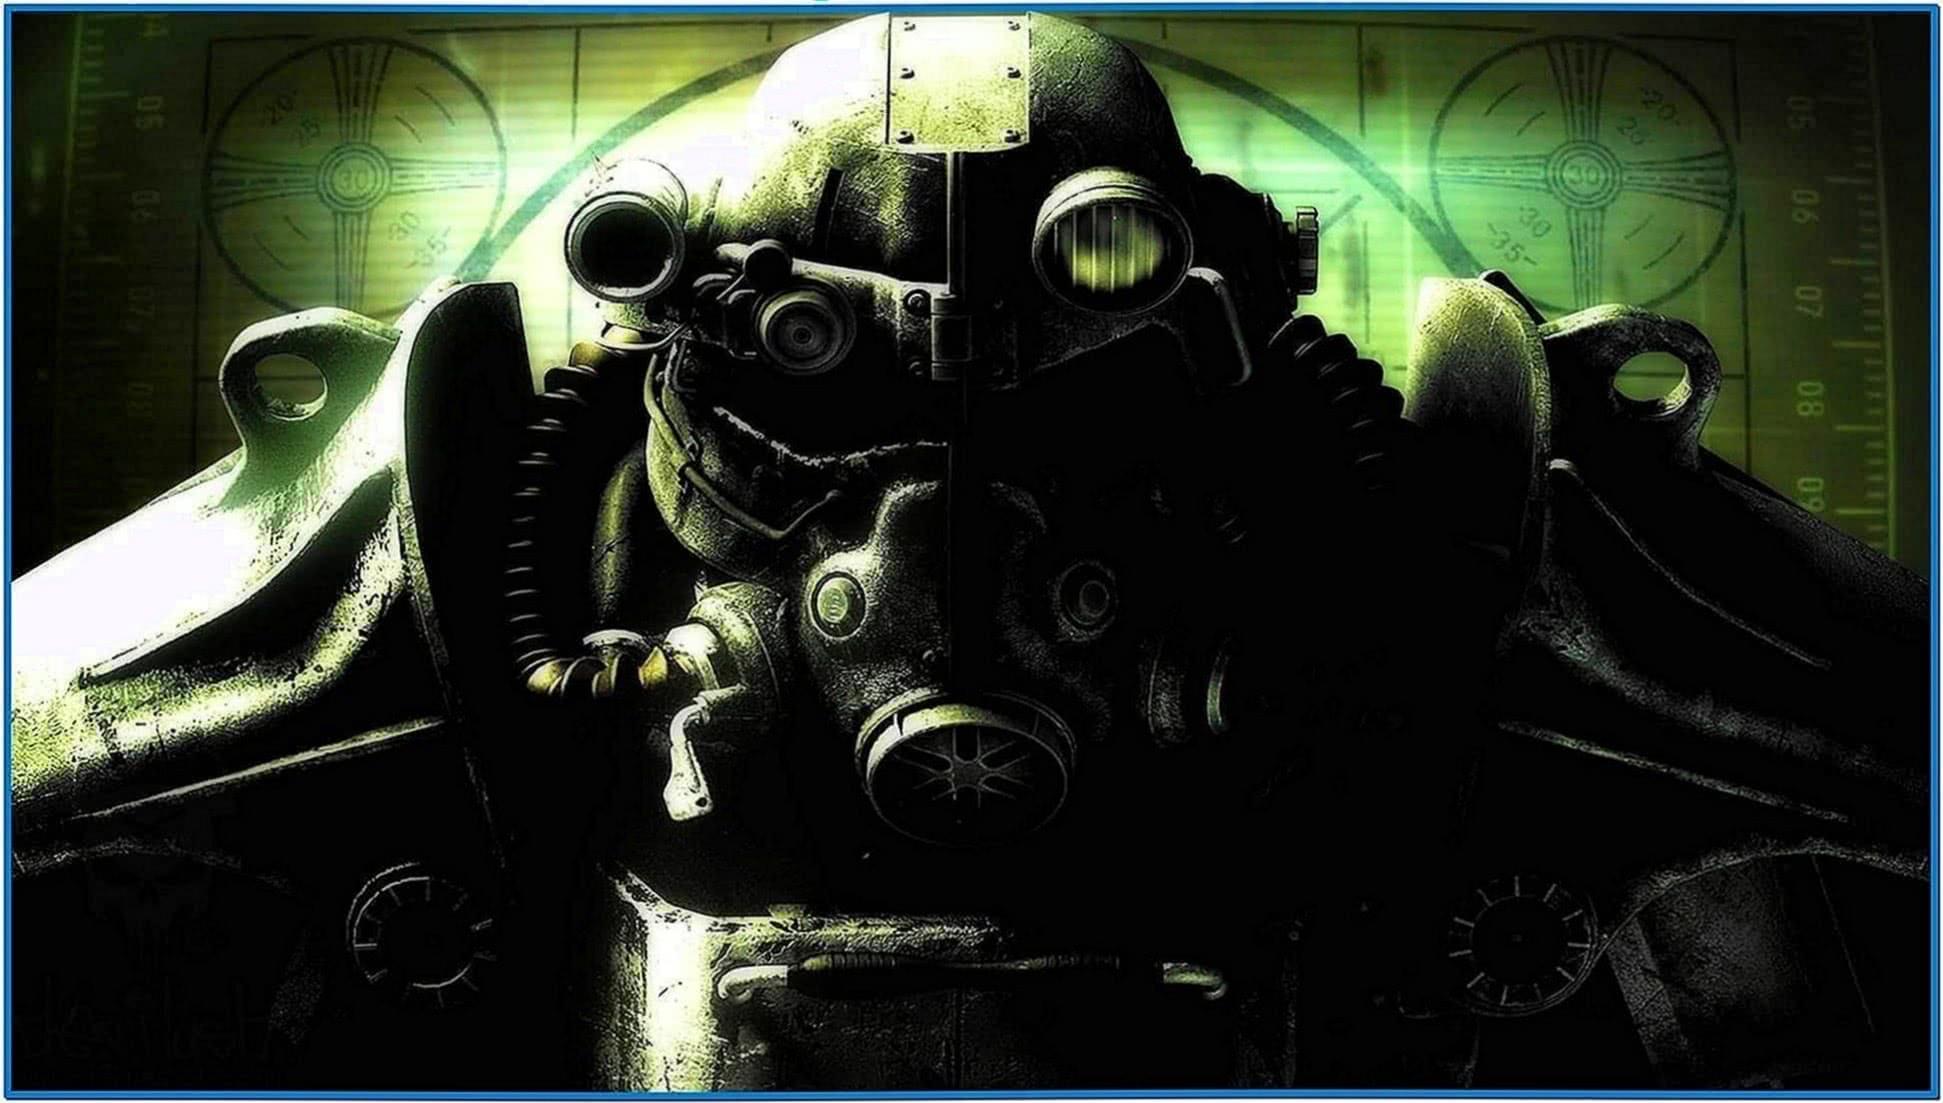 Fallout Screensaver Windows 7